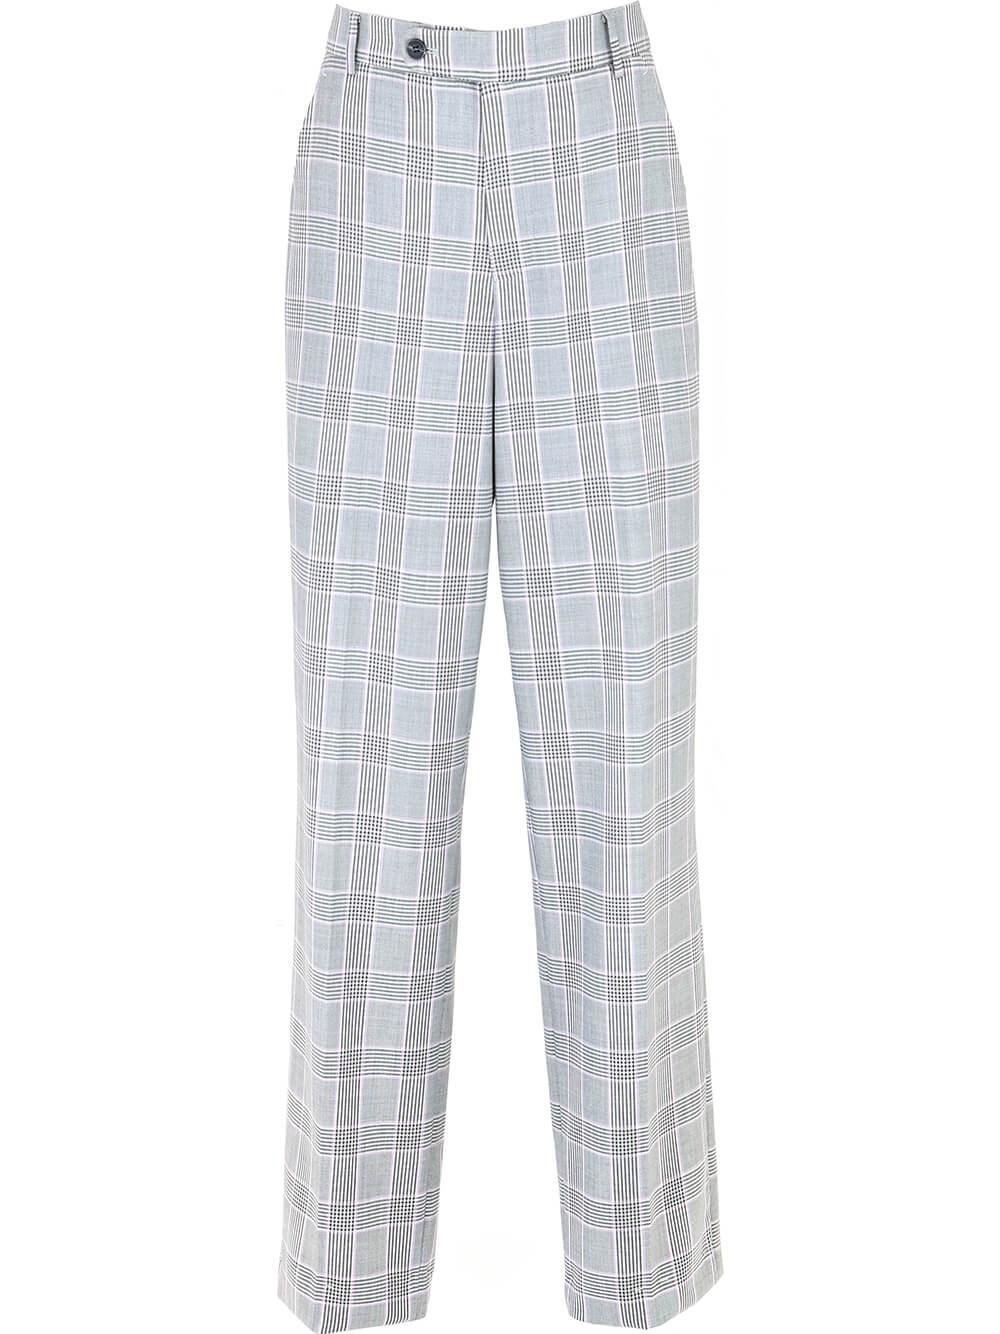 Classic High Waisted Pant Item # PANT004E